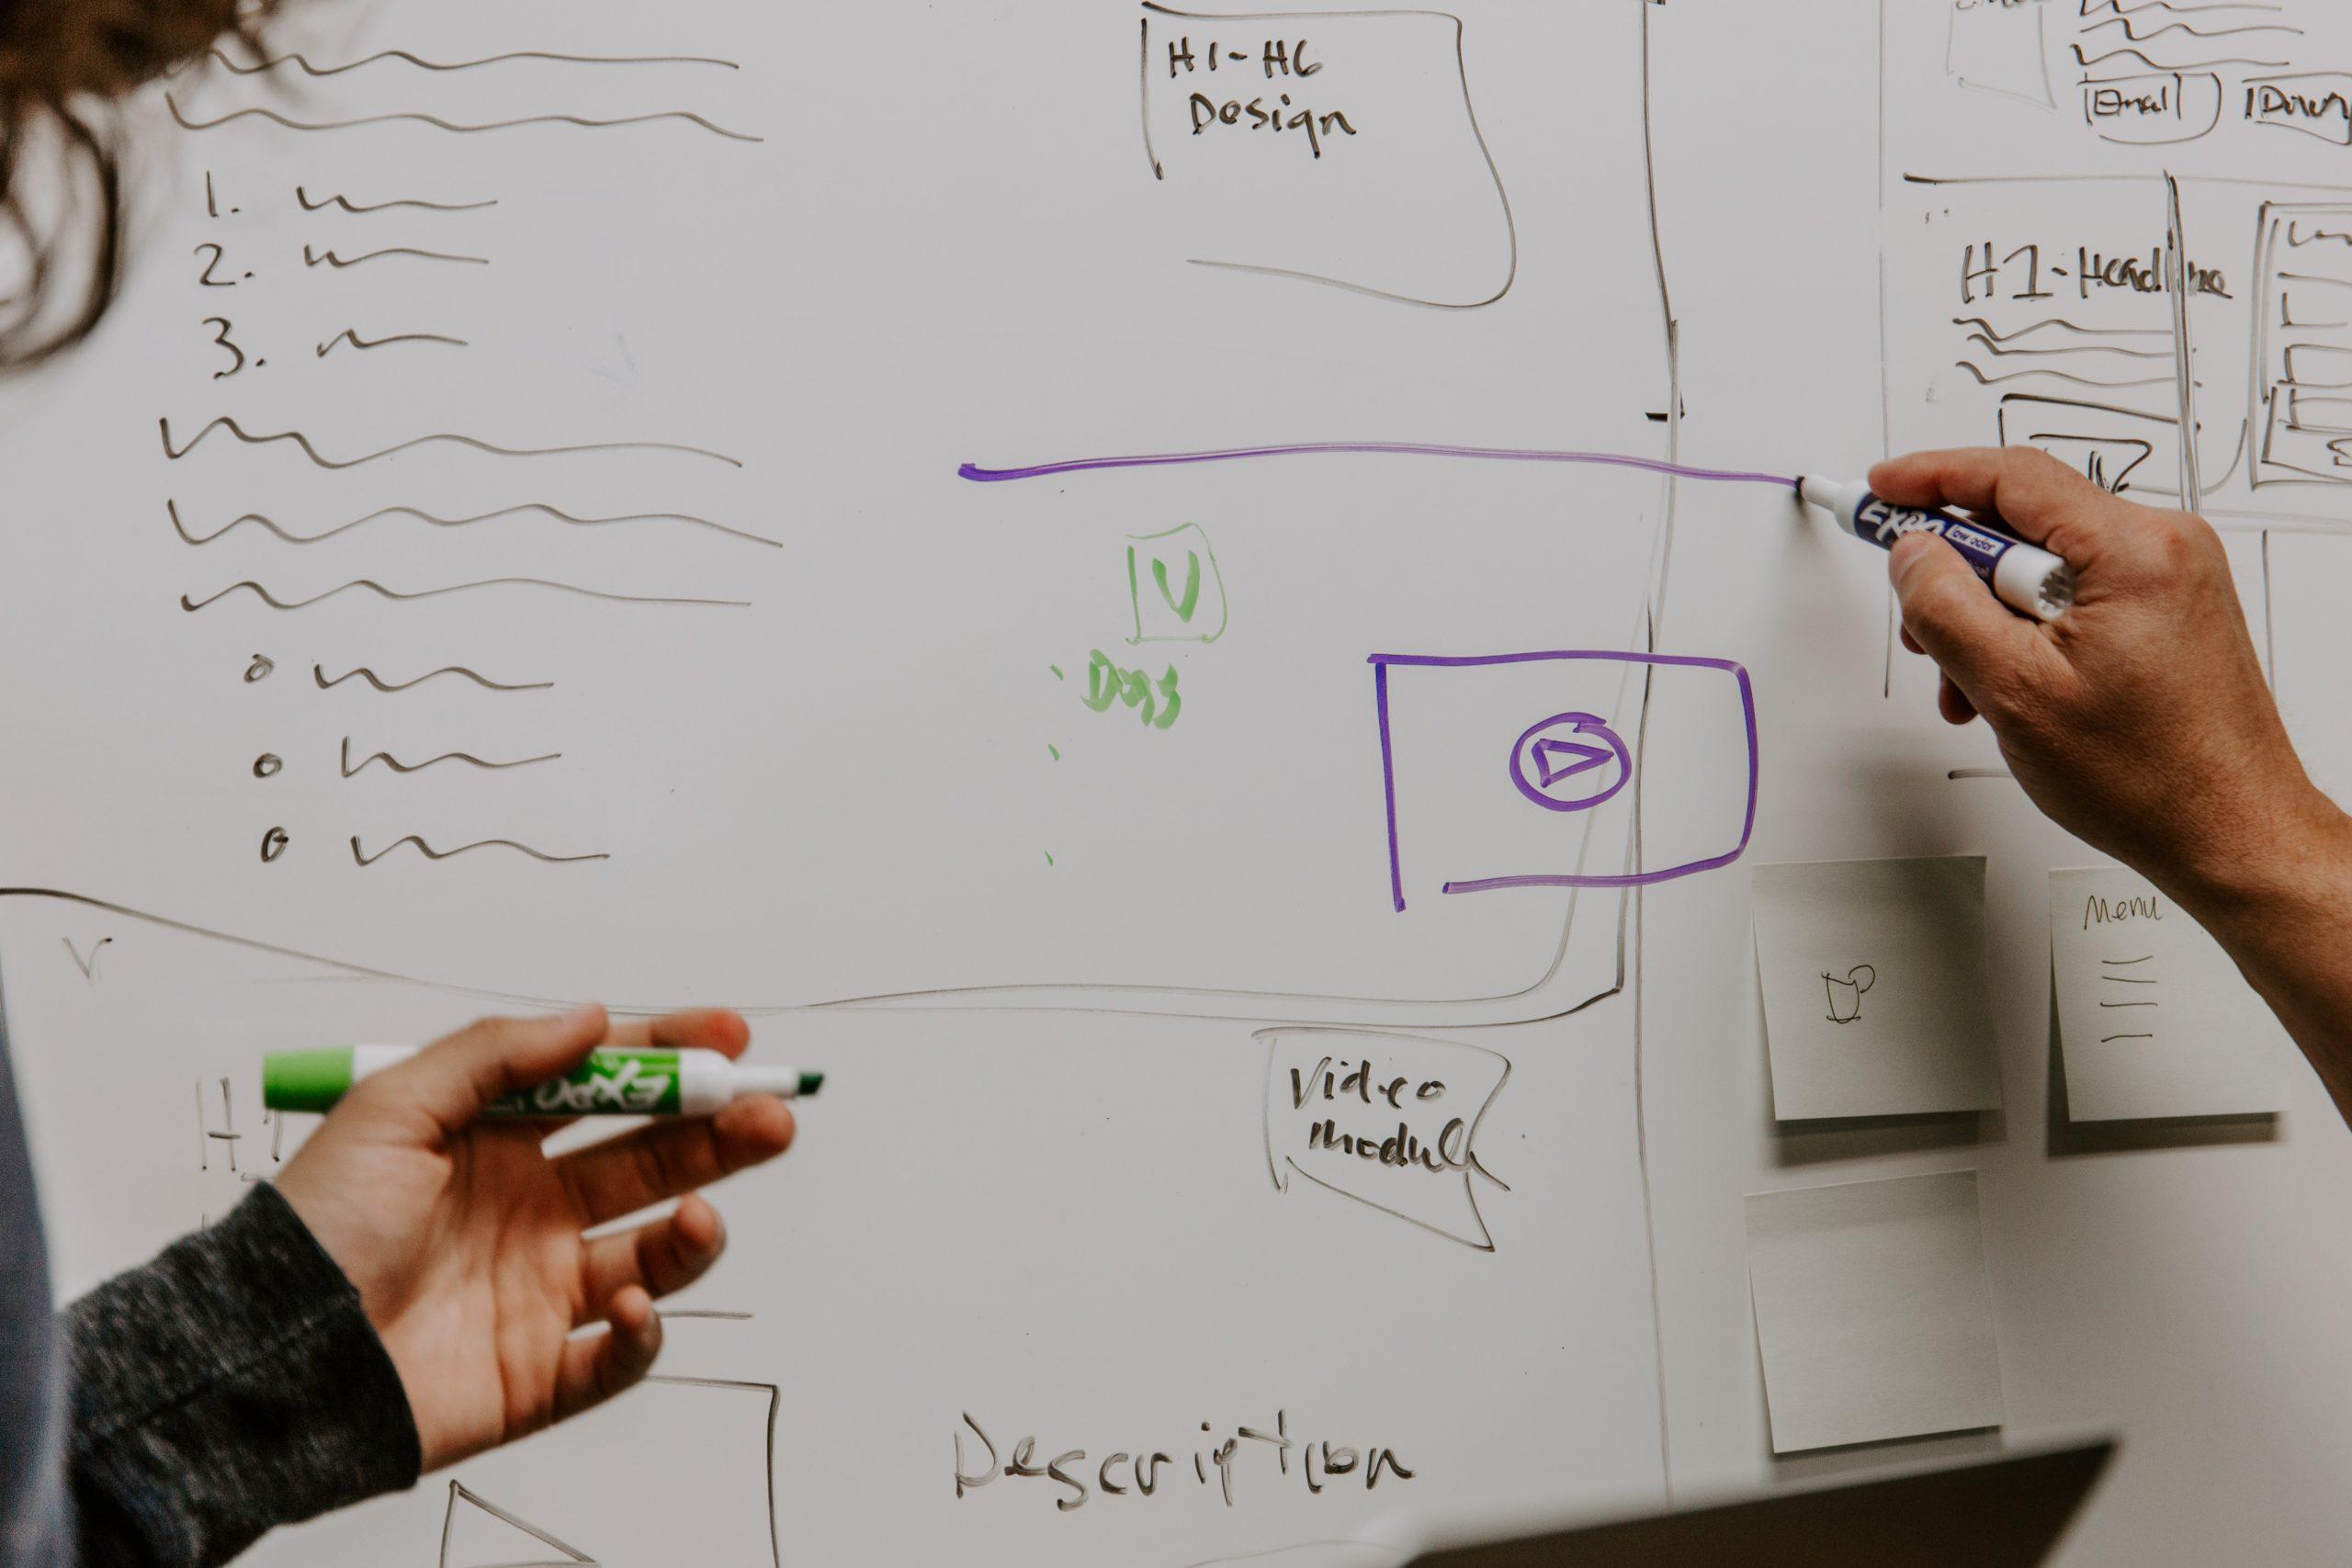 Sharing ideas via whiteboard